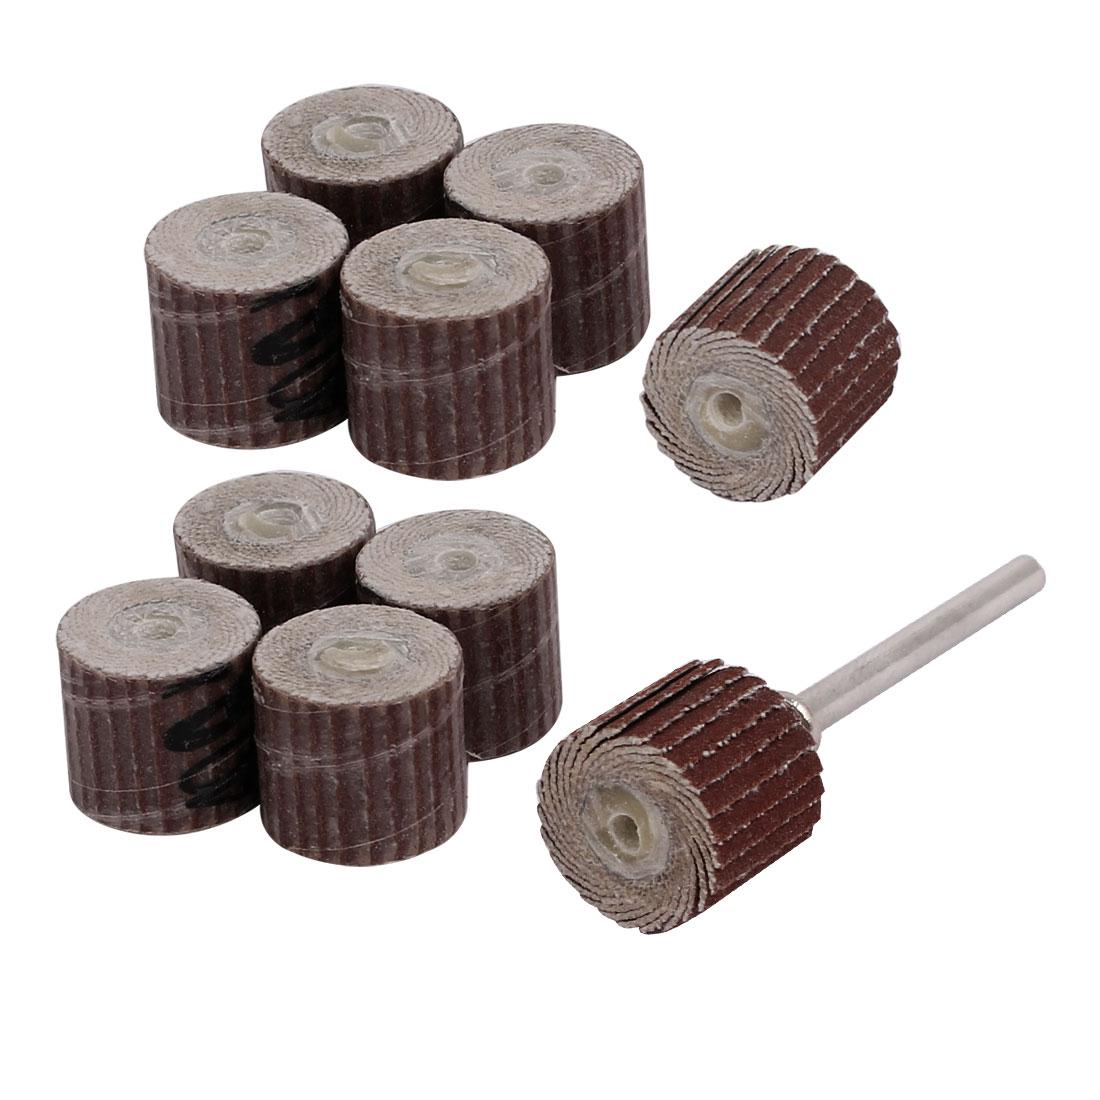 10pcs 13mm Dia 400 Grit Sandpaper Flap Sanding Wheel Grinding Head w Mandrel